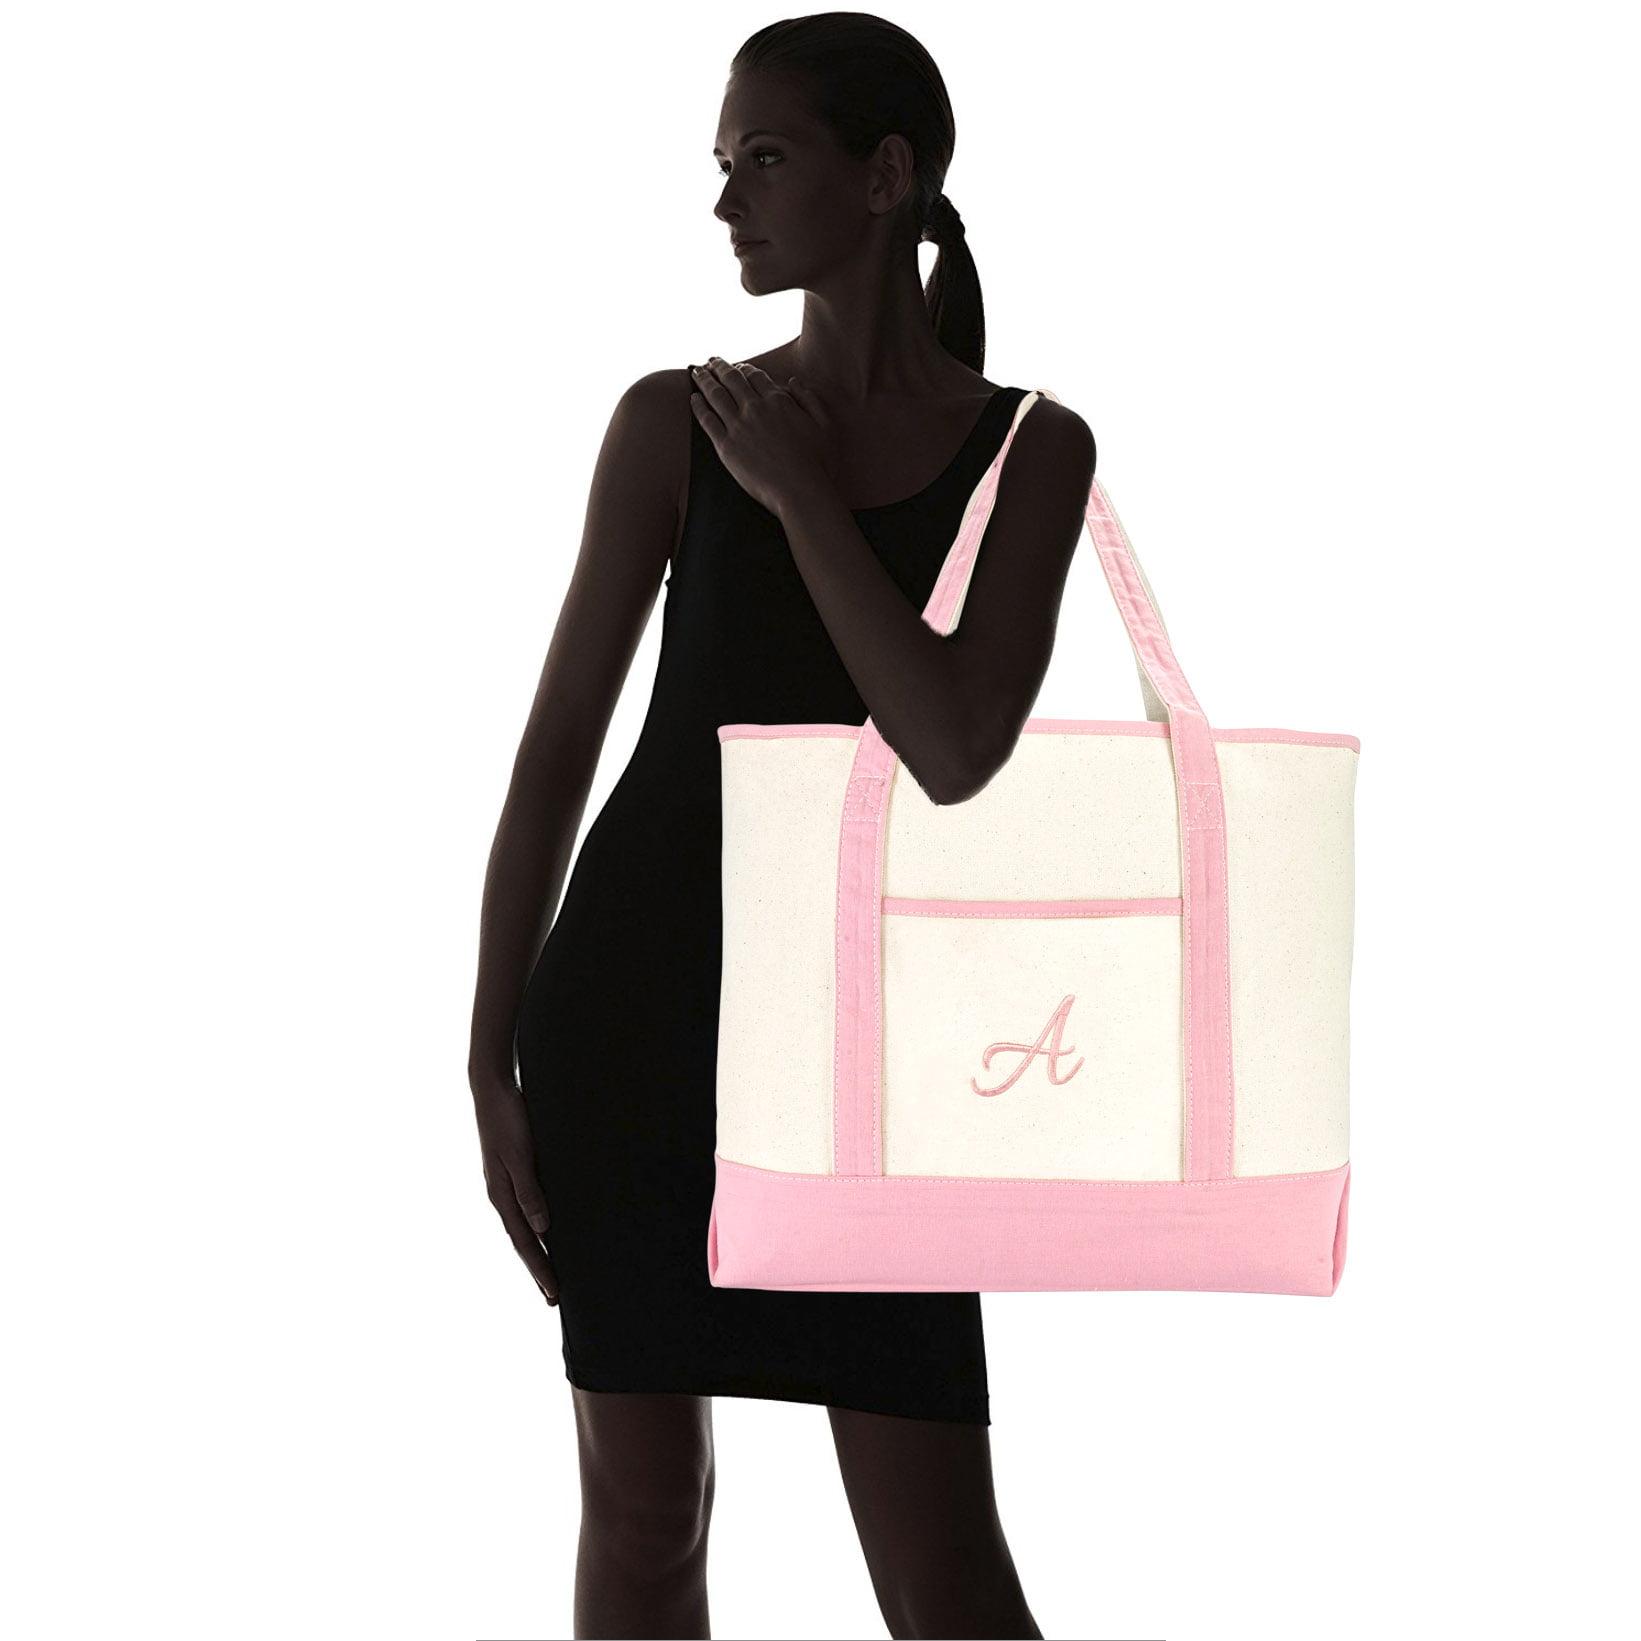 4f231a246b DALIX Women s Cotton Canvas Tote Bag Large Shoulder Bags Pink Monogram S -  Walmart.com